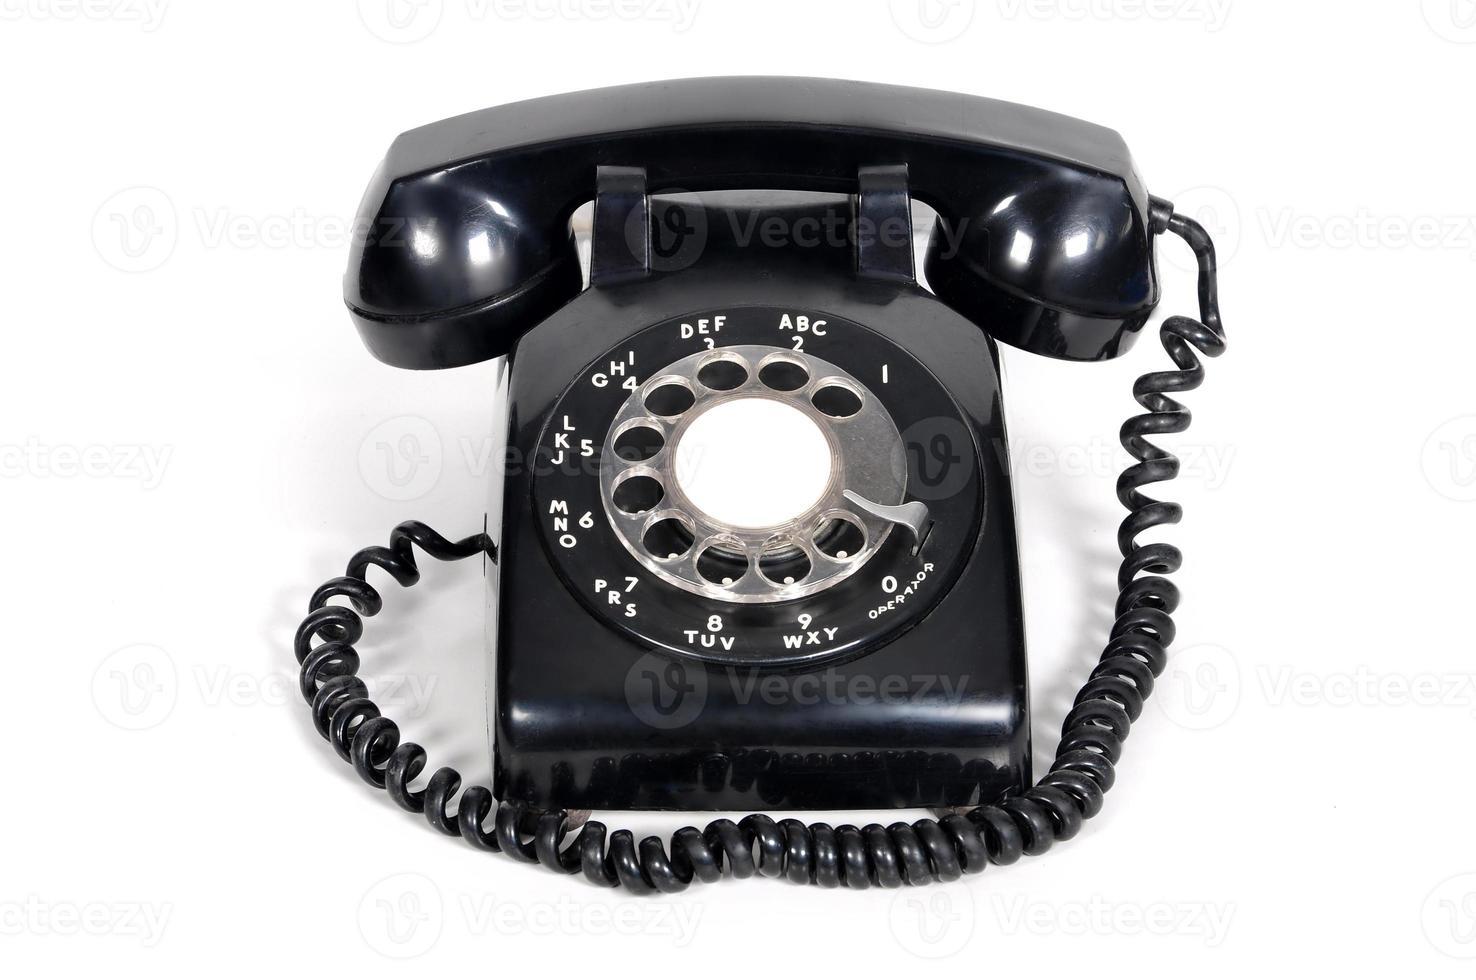 geïsoleerde vintage telefoon op witte achtergrond foto